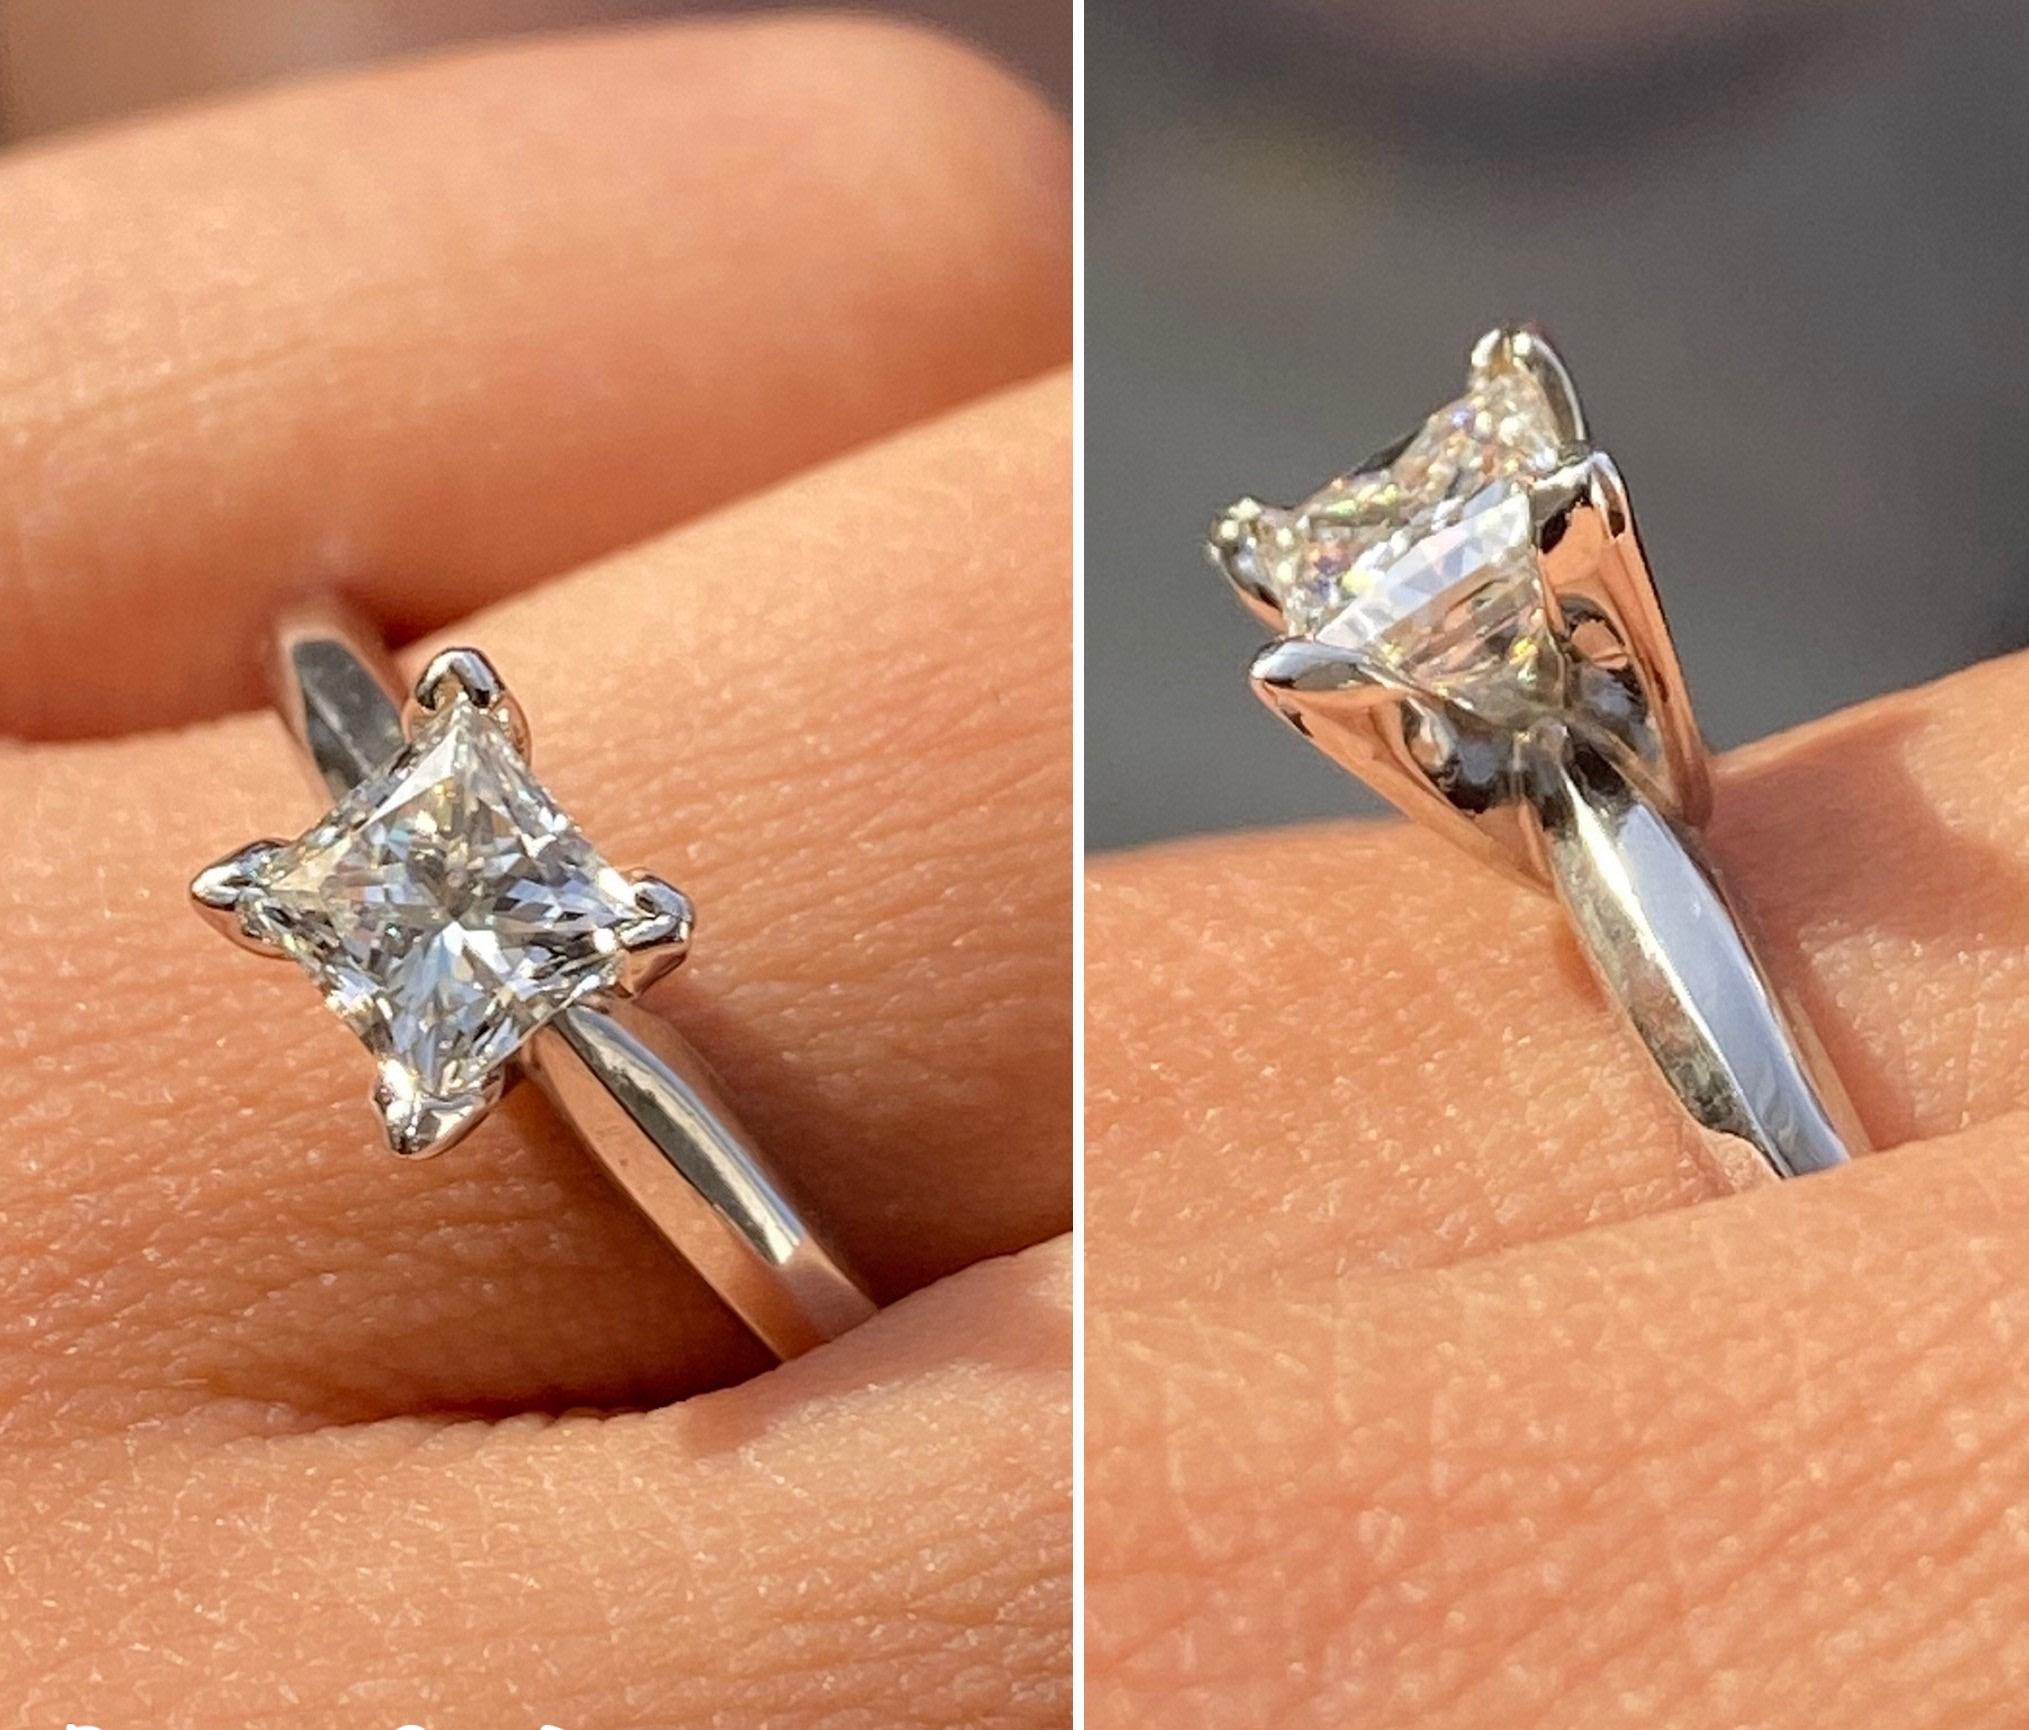 Princess Cut Diamond Engagement Ring - Image